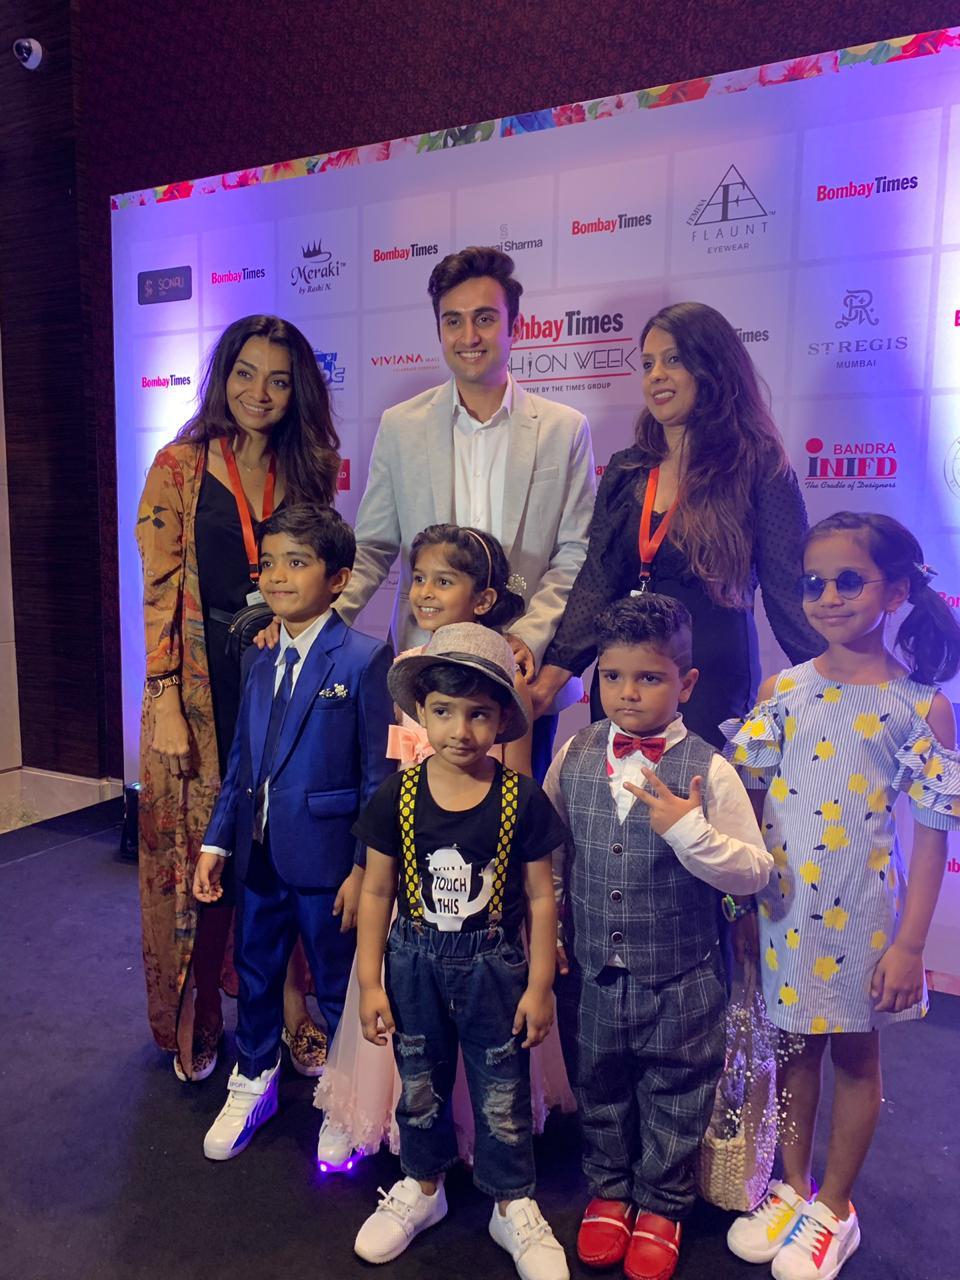 Hopscotch At Bombay Times Fashion Week - 3